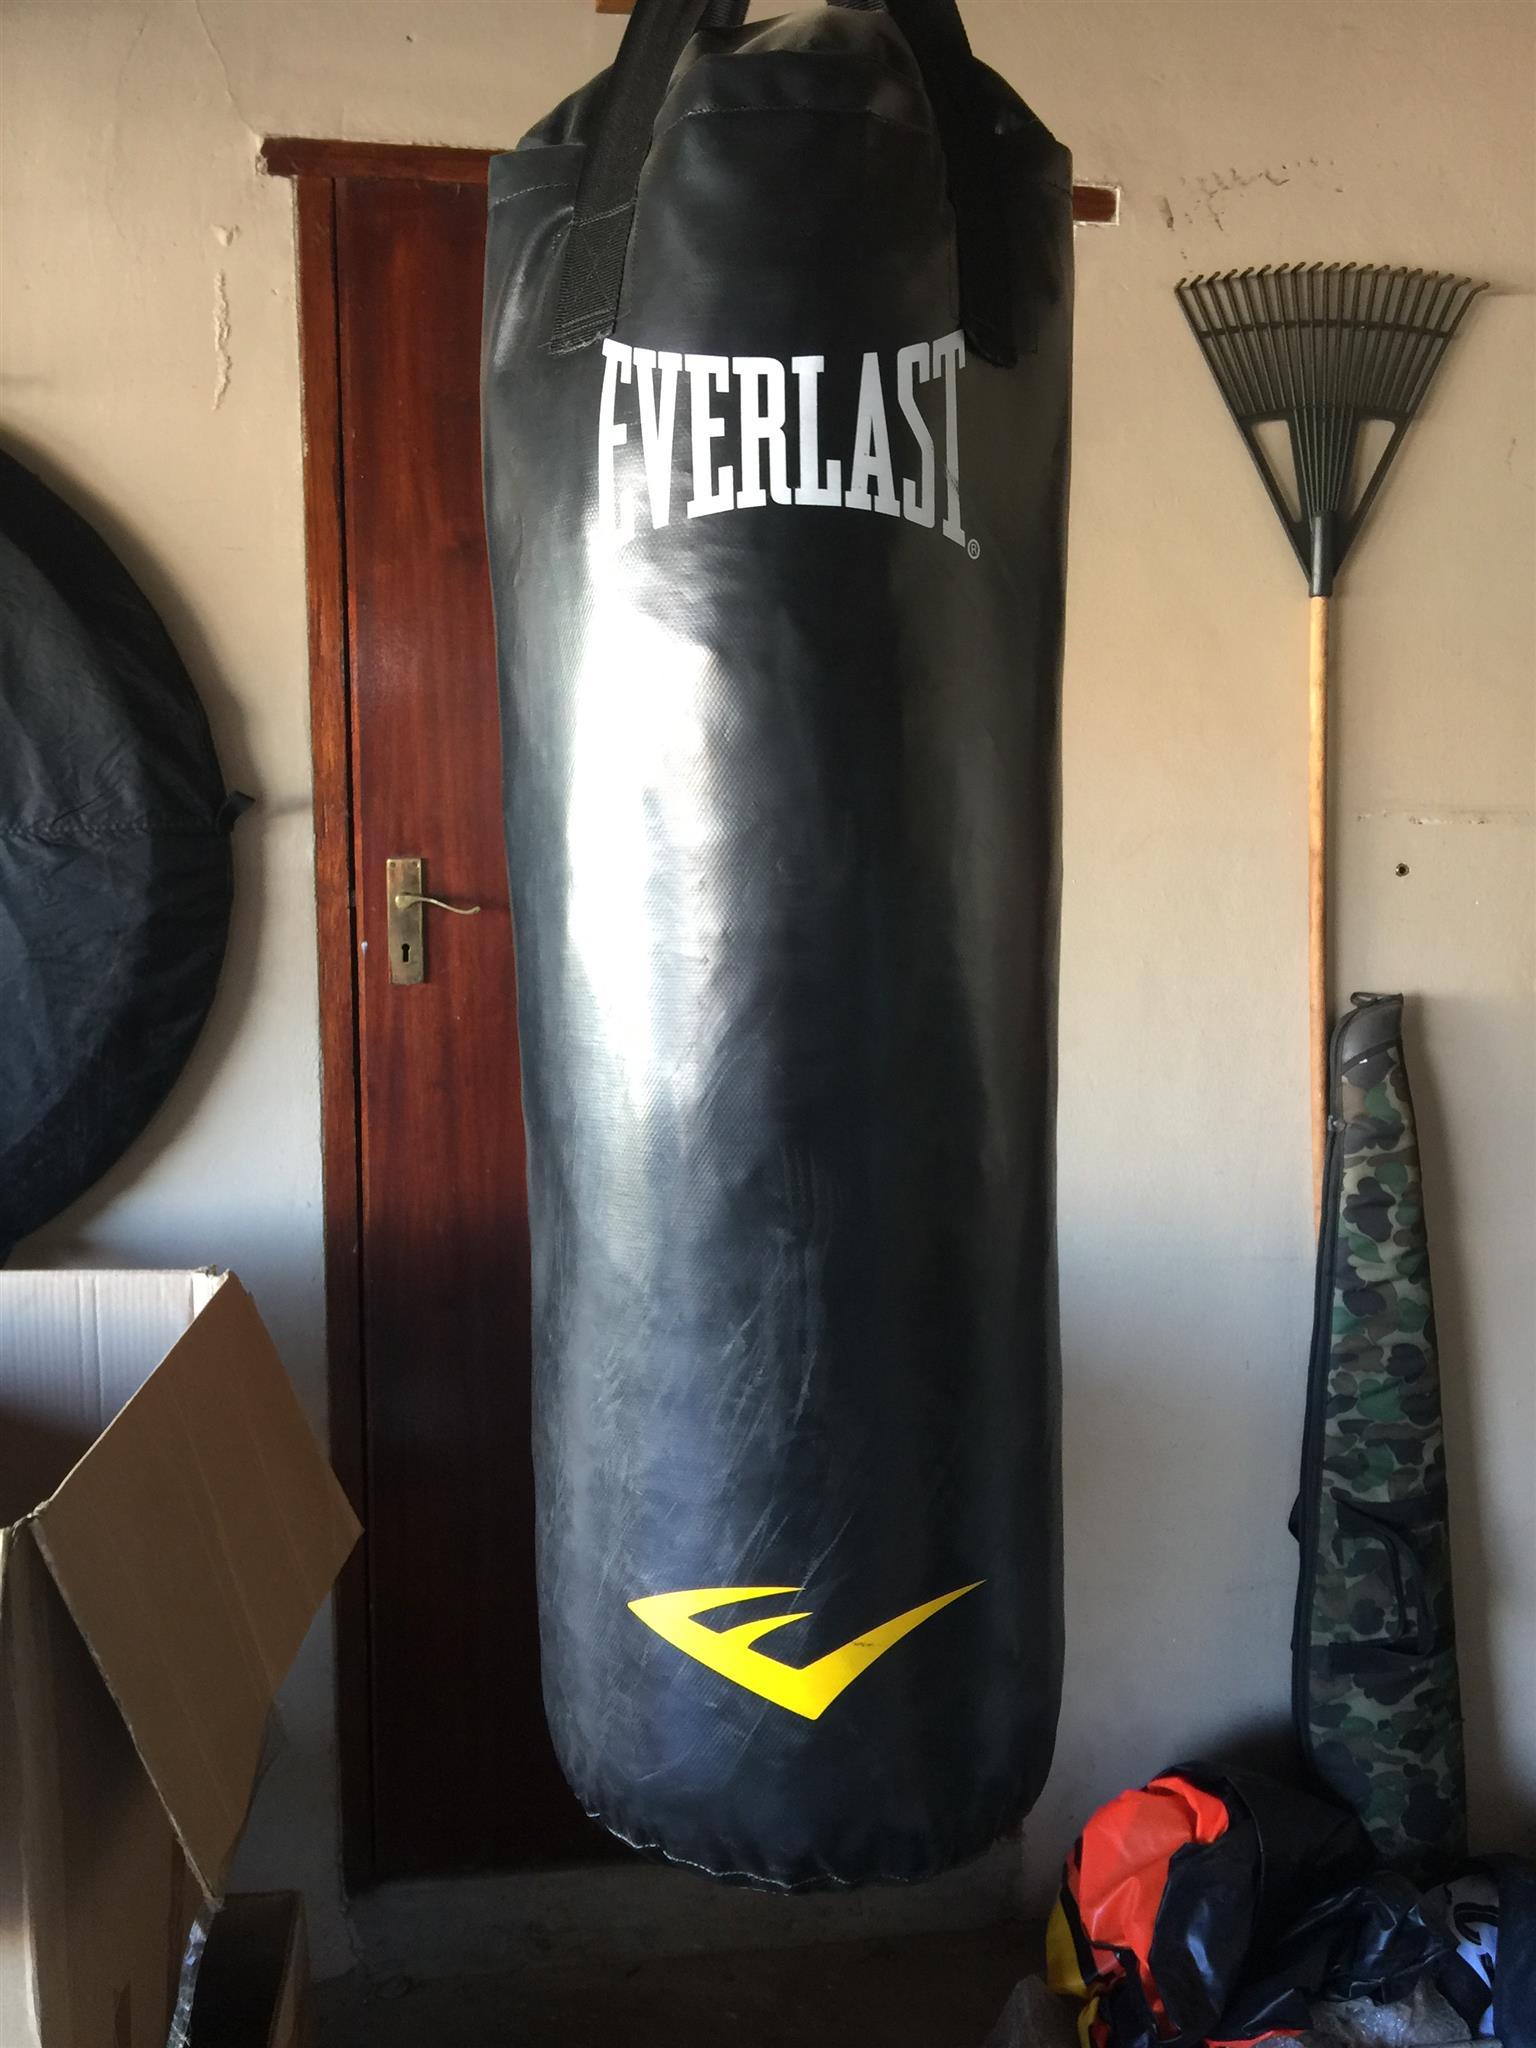 Everlast Punching bag.